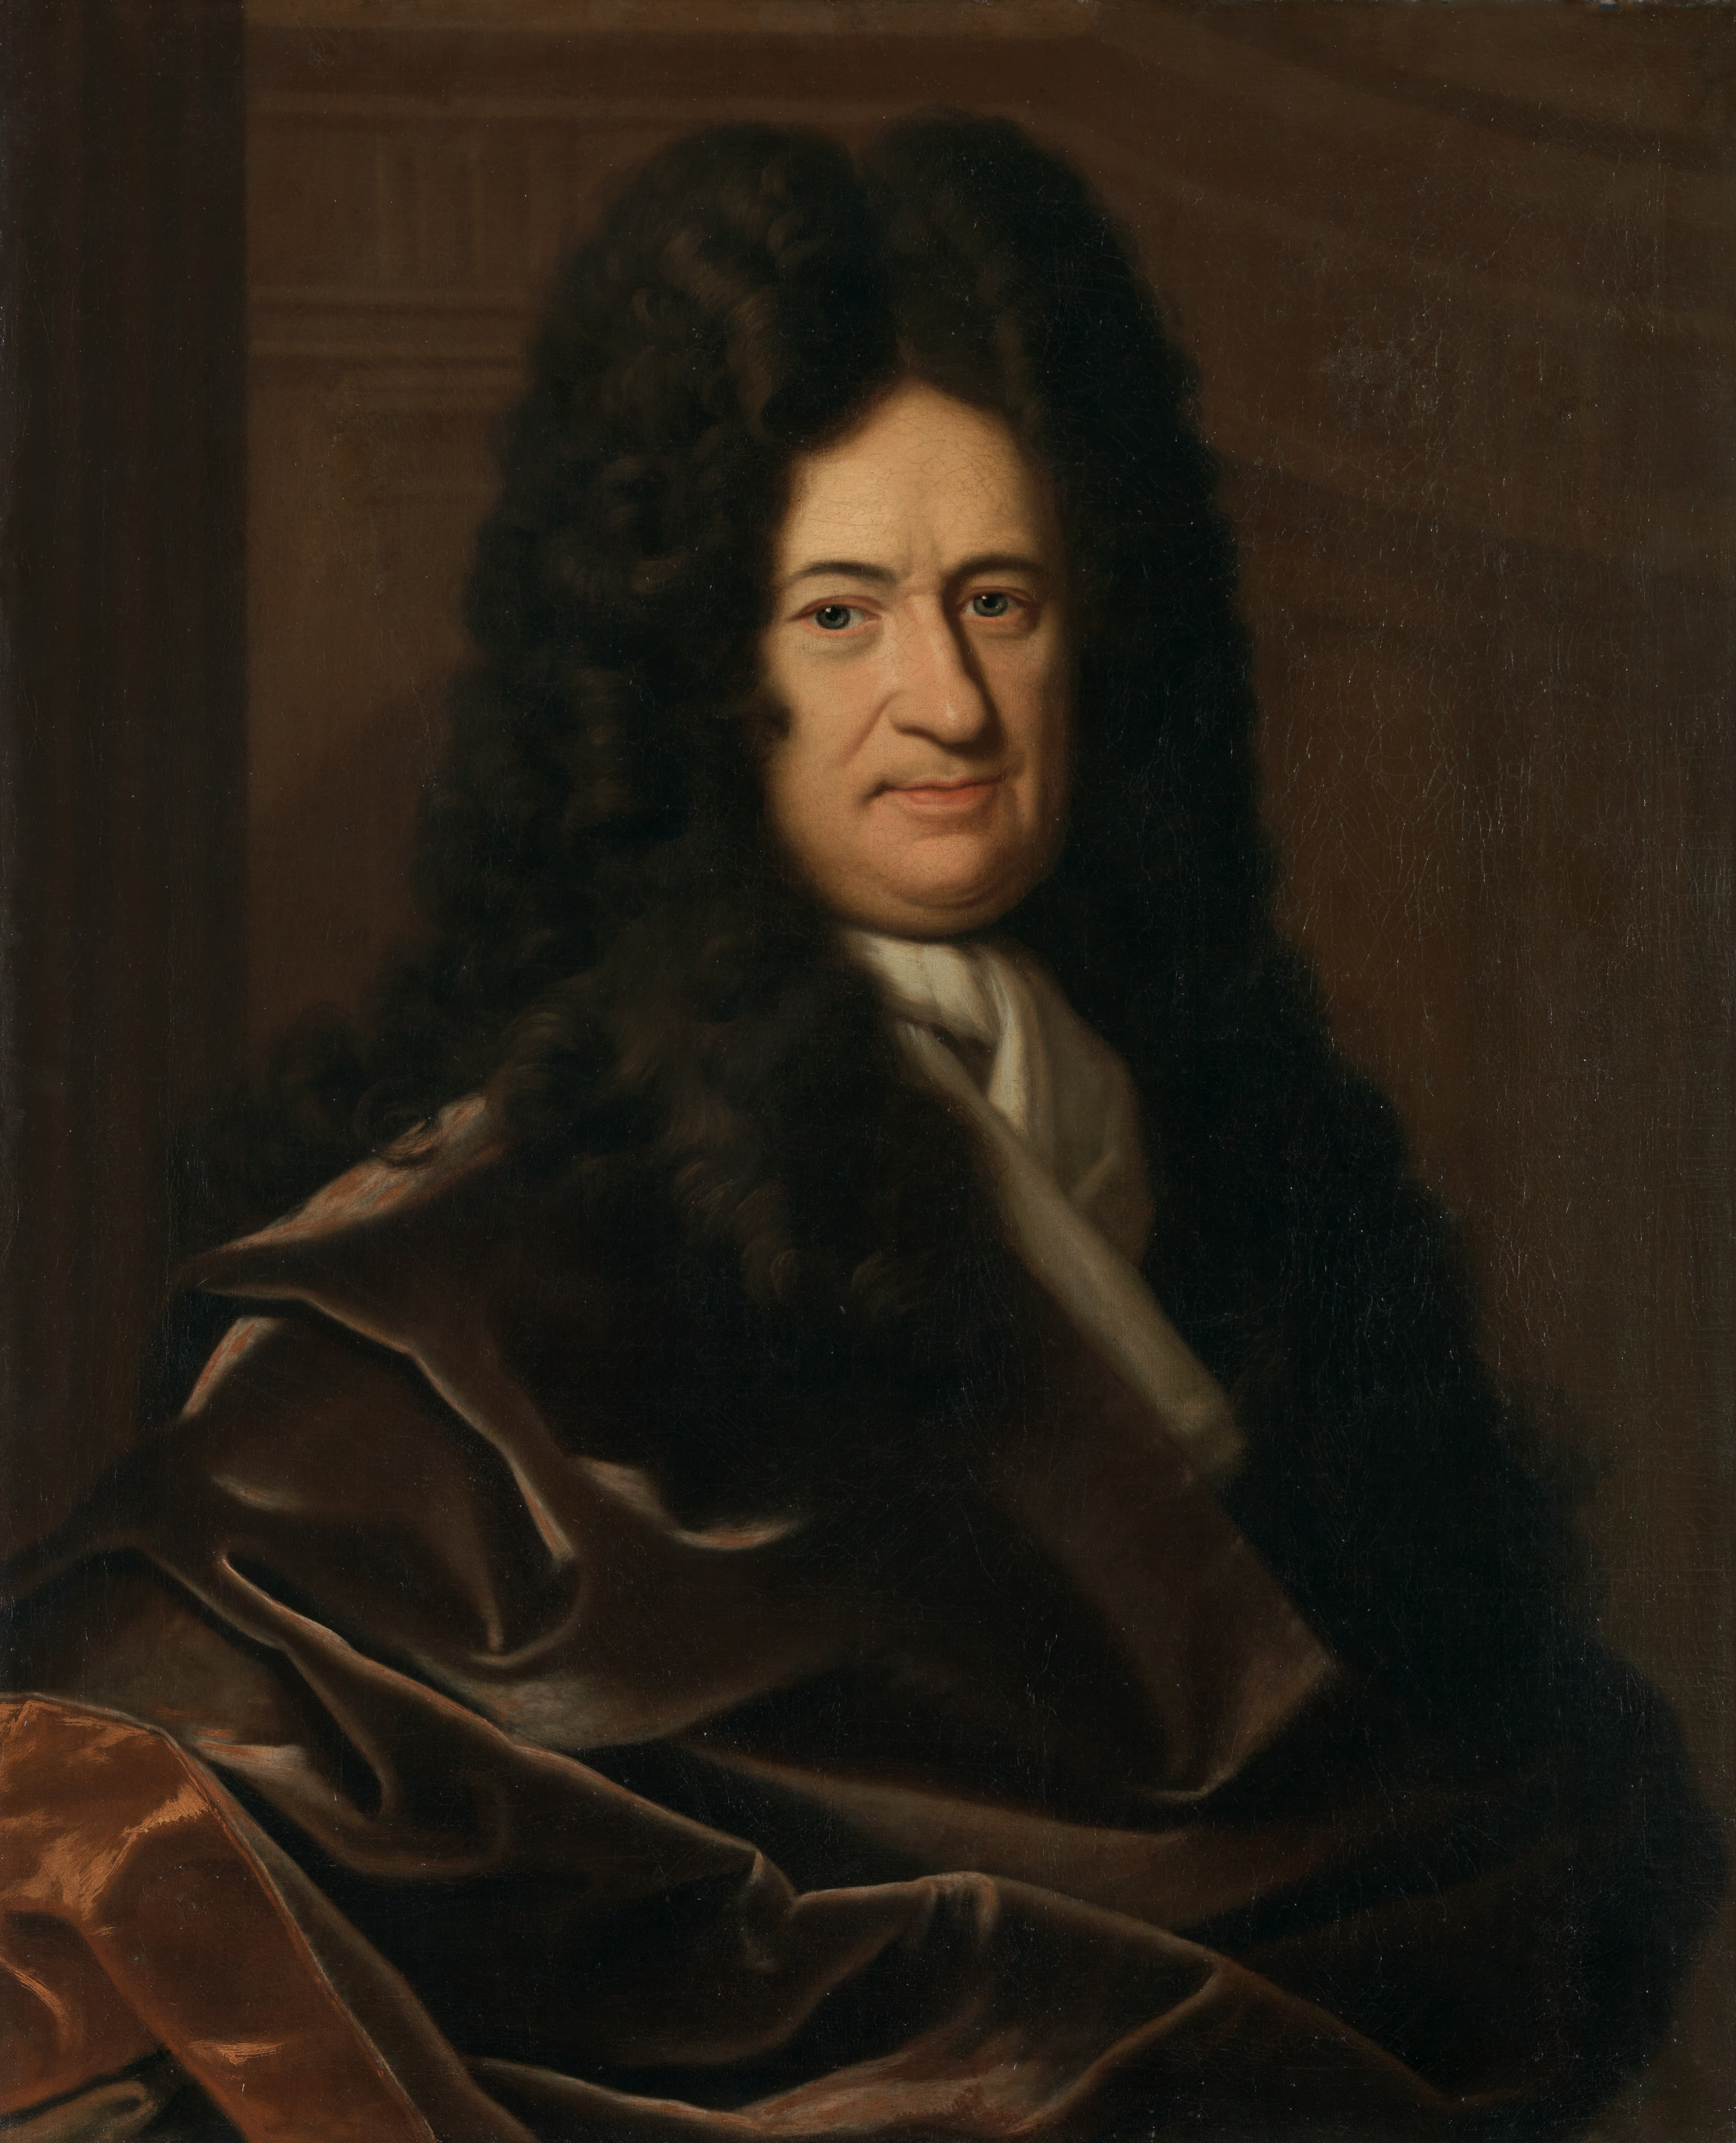 image of Gottfried Wilhelm Leibniz